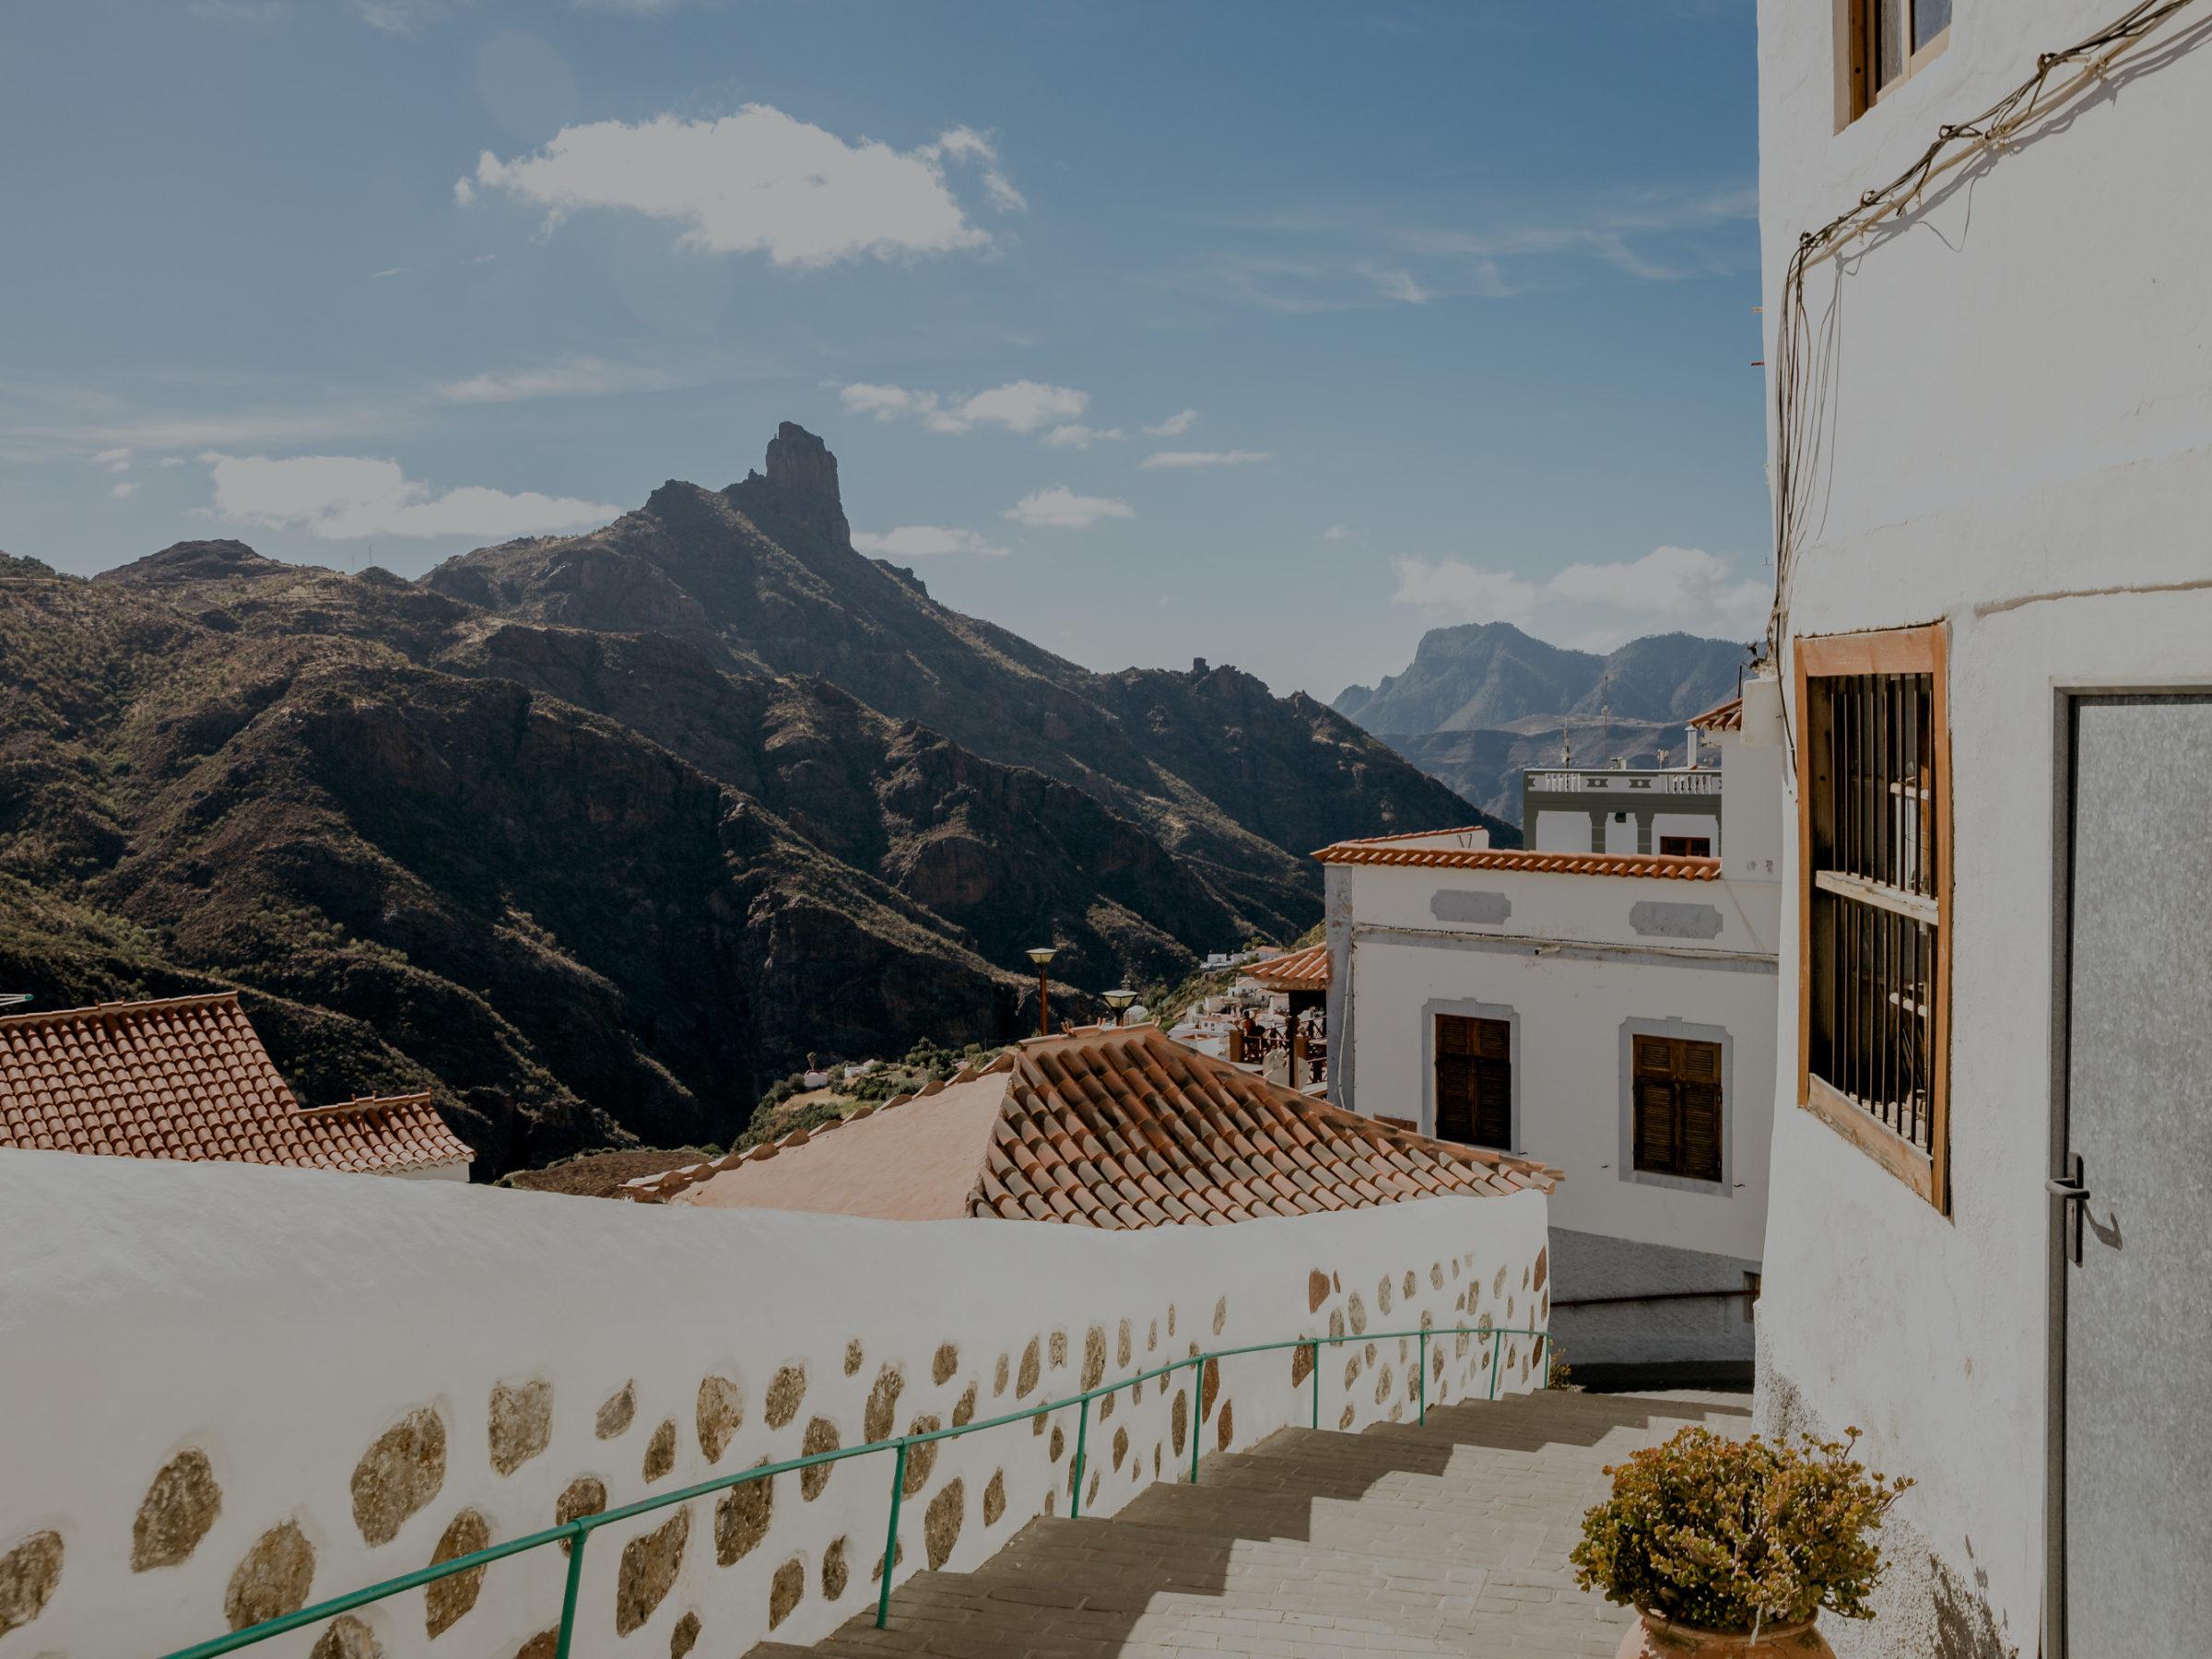 Tejeda, Hiszpania